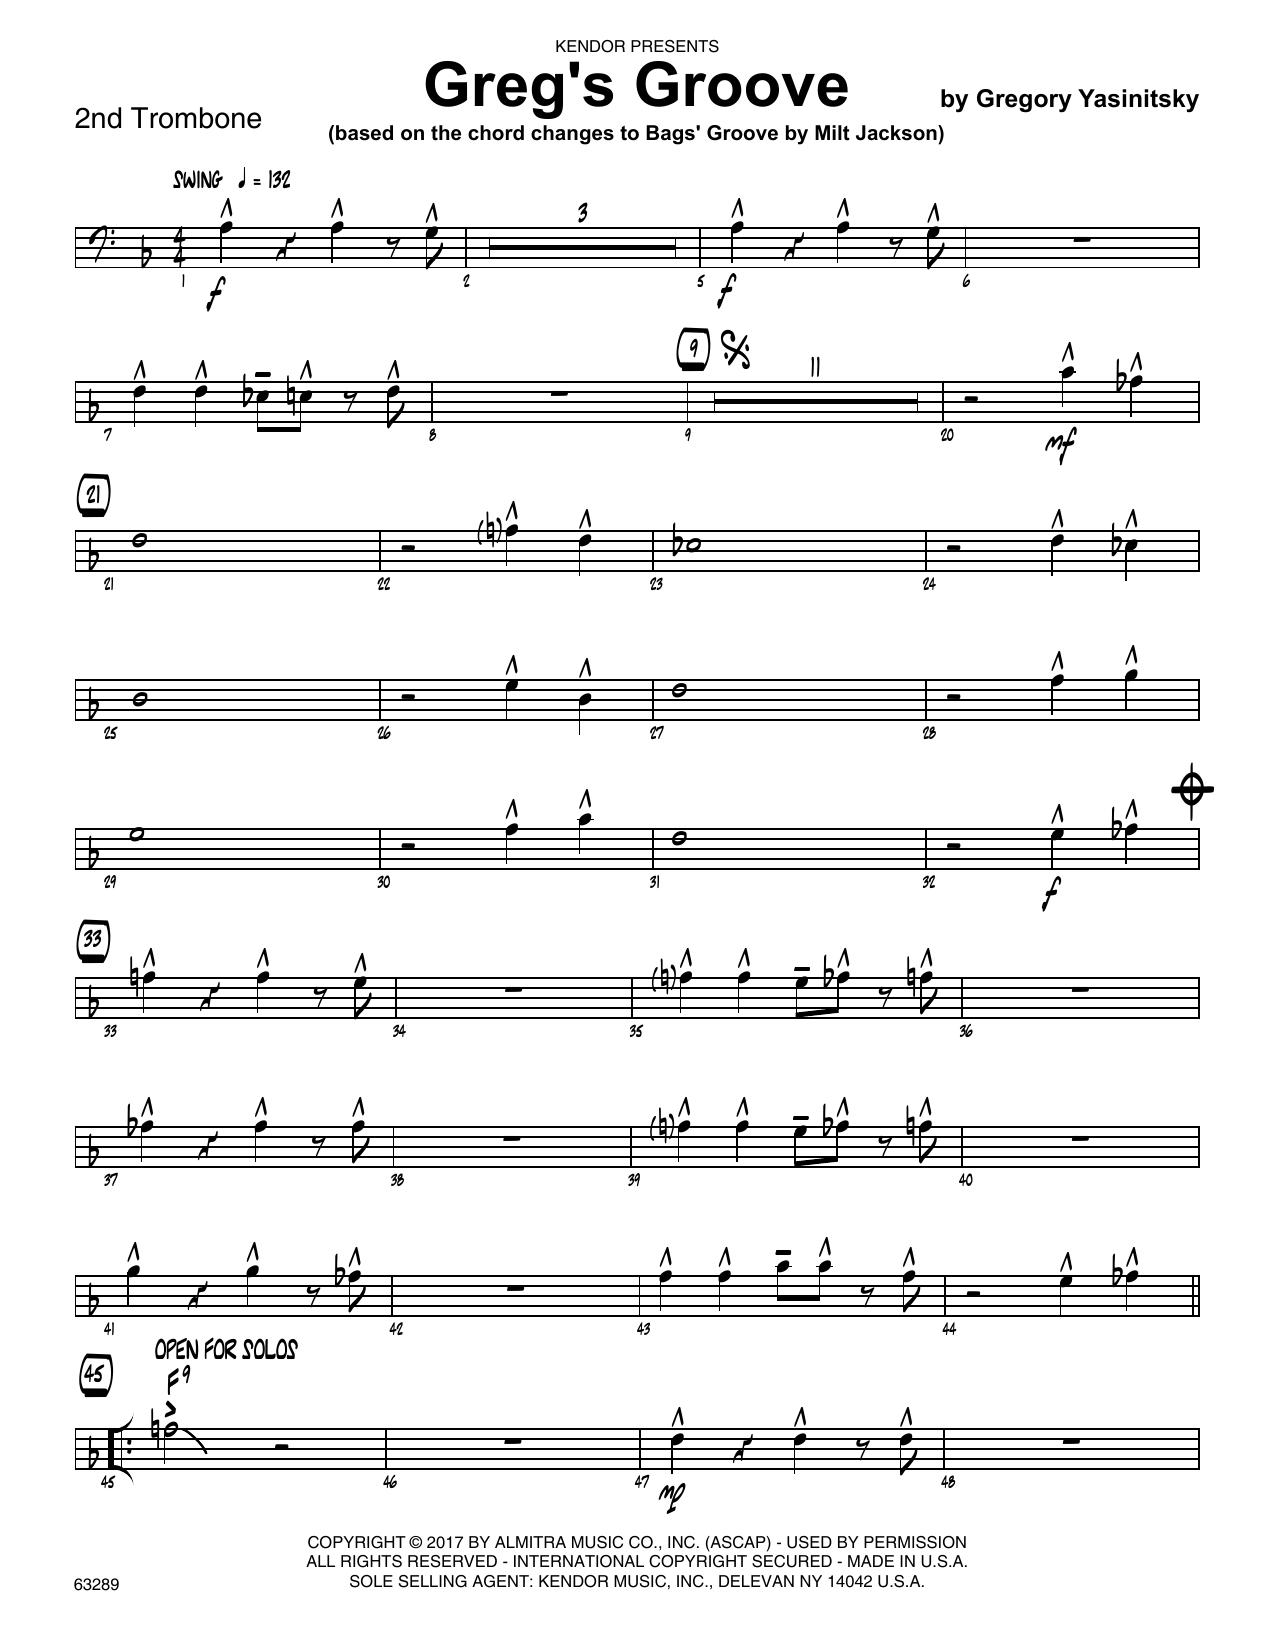 Greg's Groove - 2nd Trombone Sheet Music